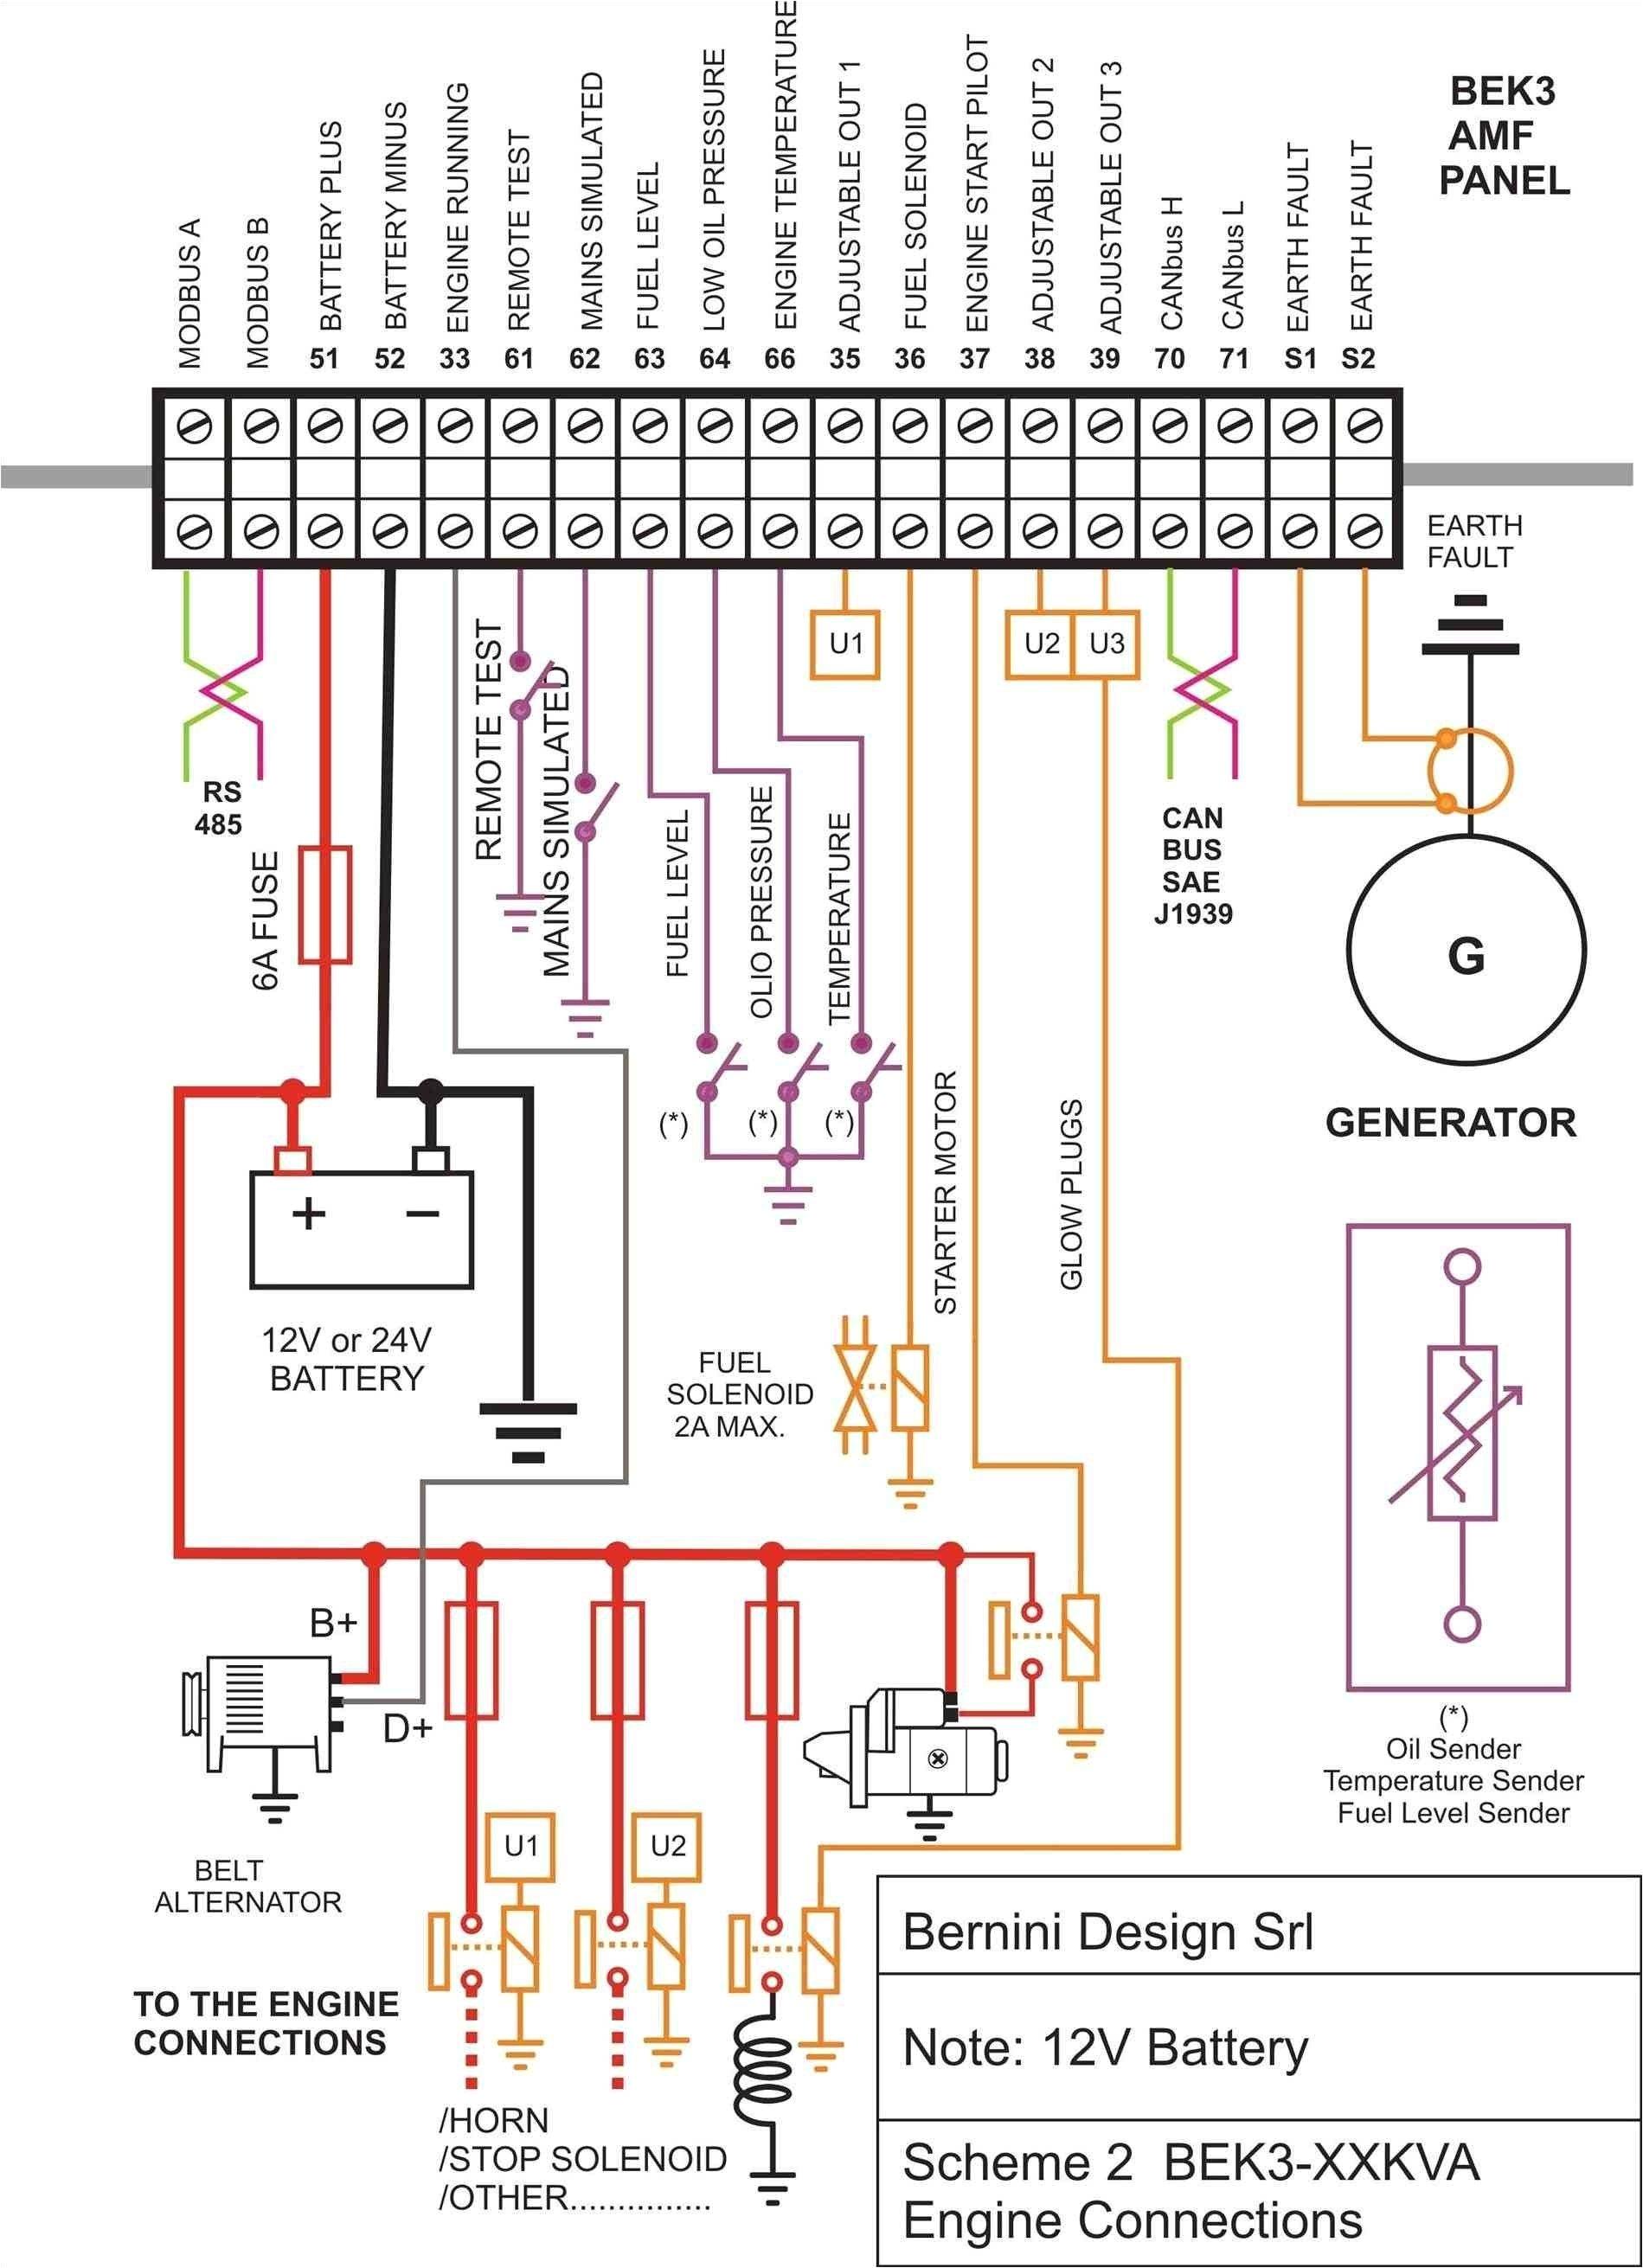 wiring house alarm schema diagram database adt alarm panel wiring diagram adt alarm system wiring diagram